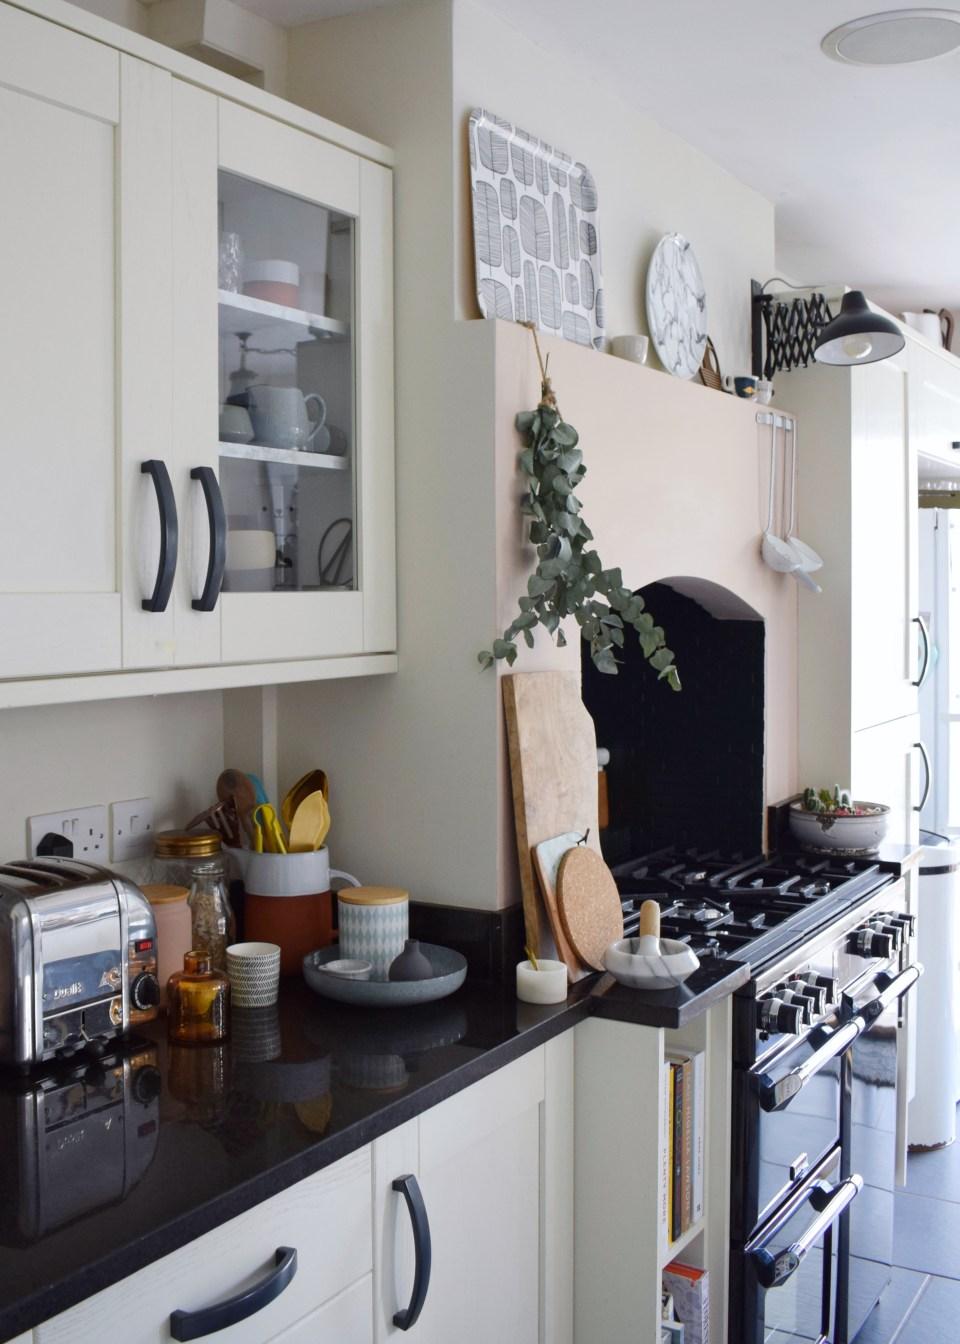 Kitchen Farrow ball slipper satin, vintage Scandinavian rustic budget kitchen refresh, artisan design and styling, eucalyptus (1)